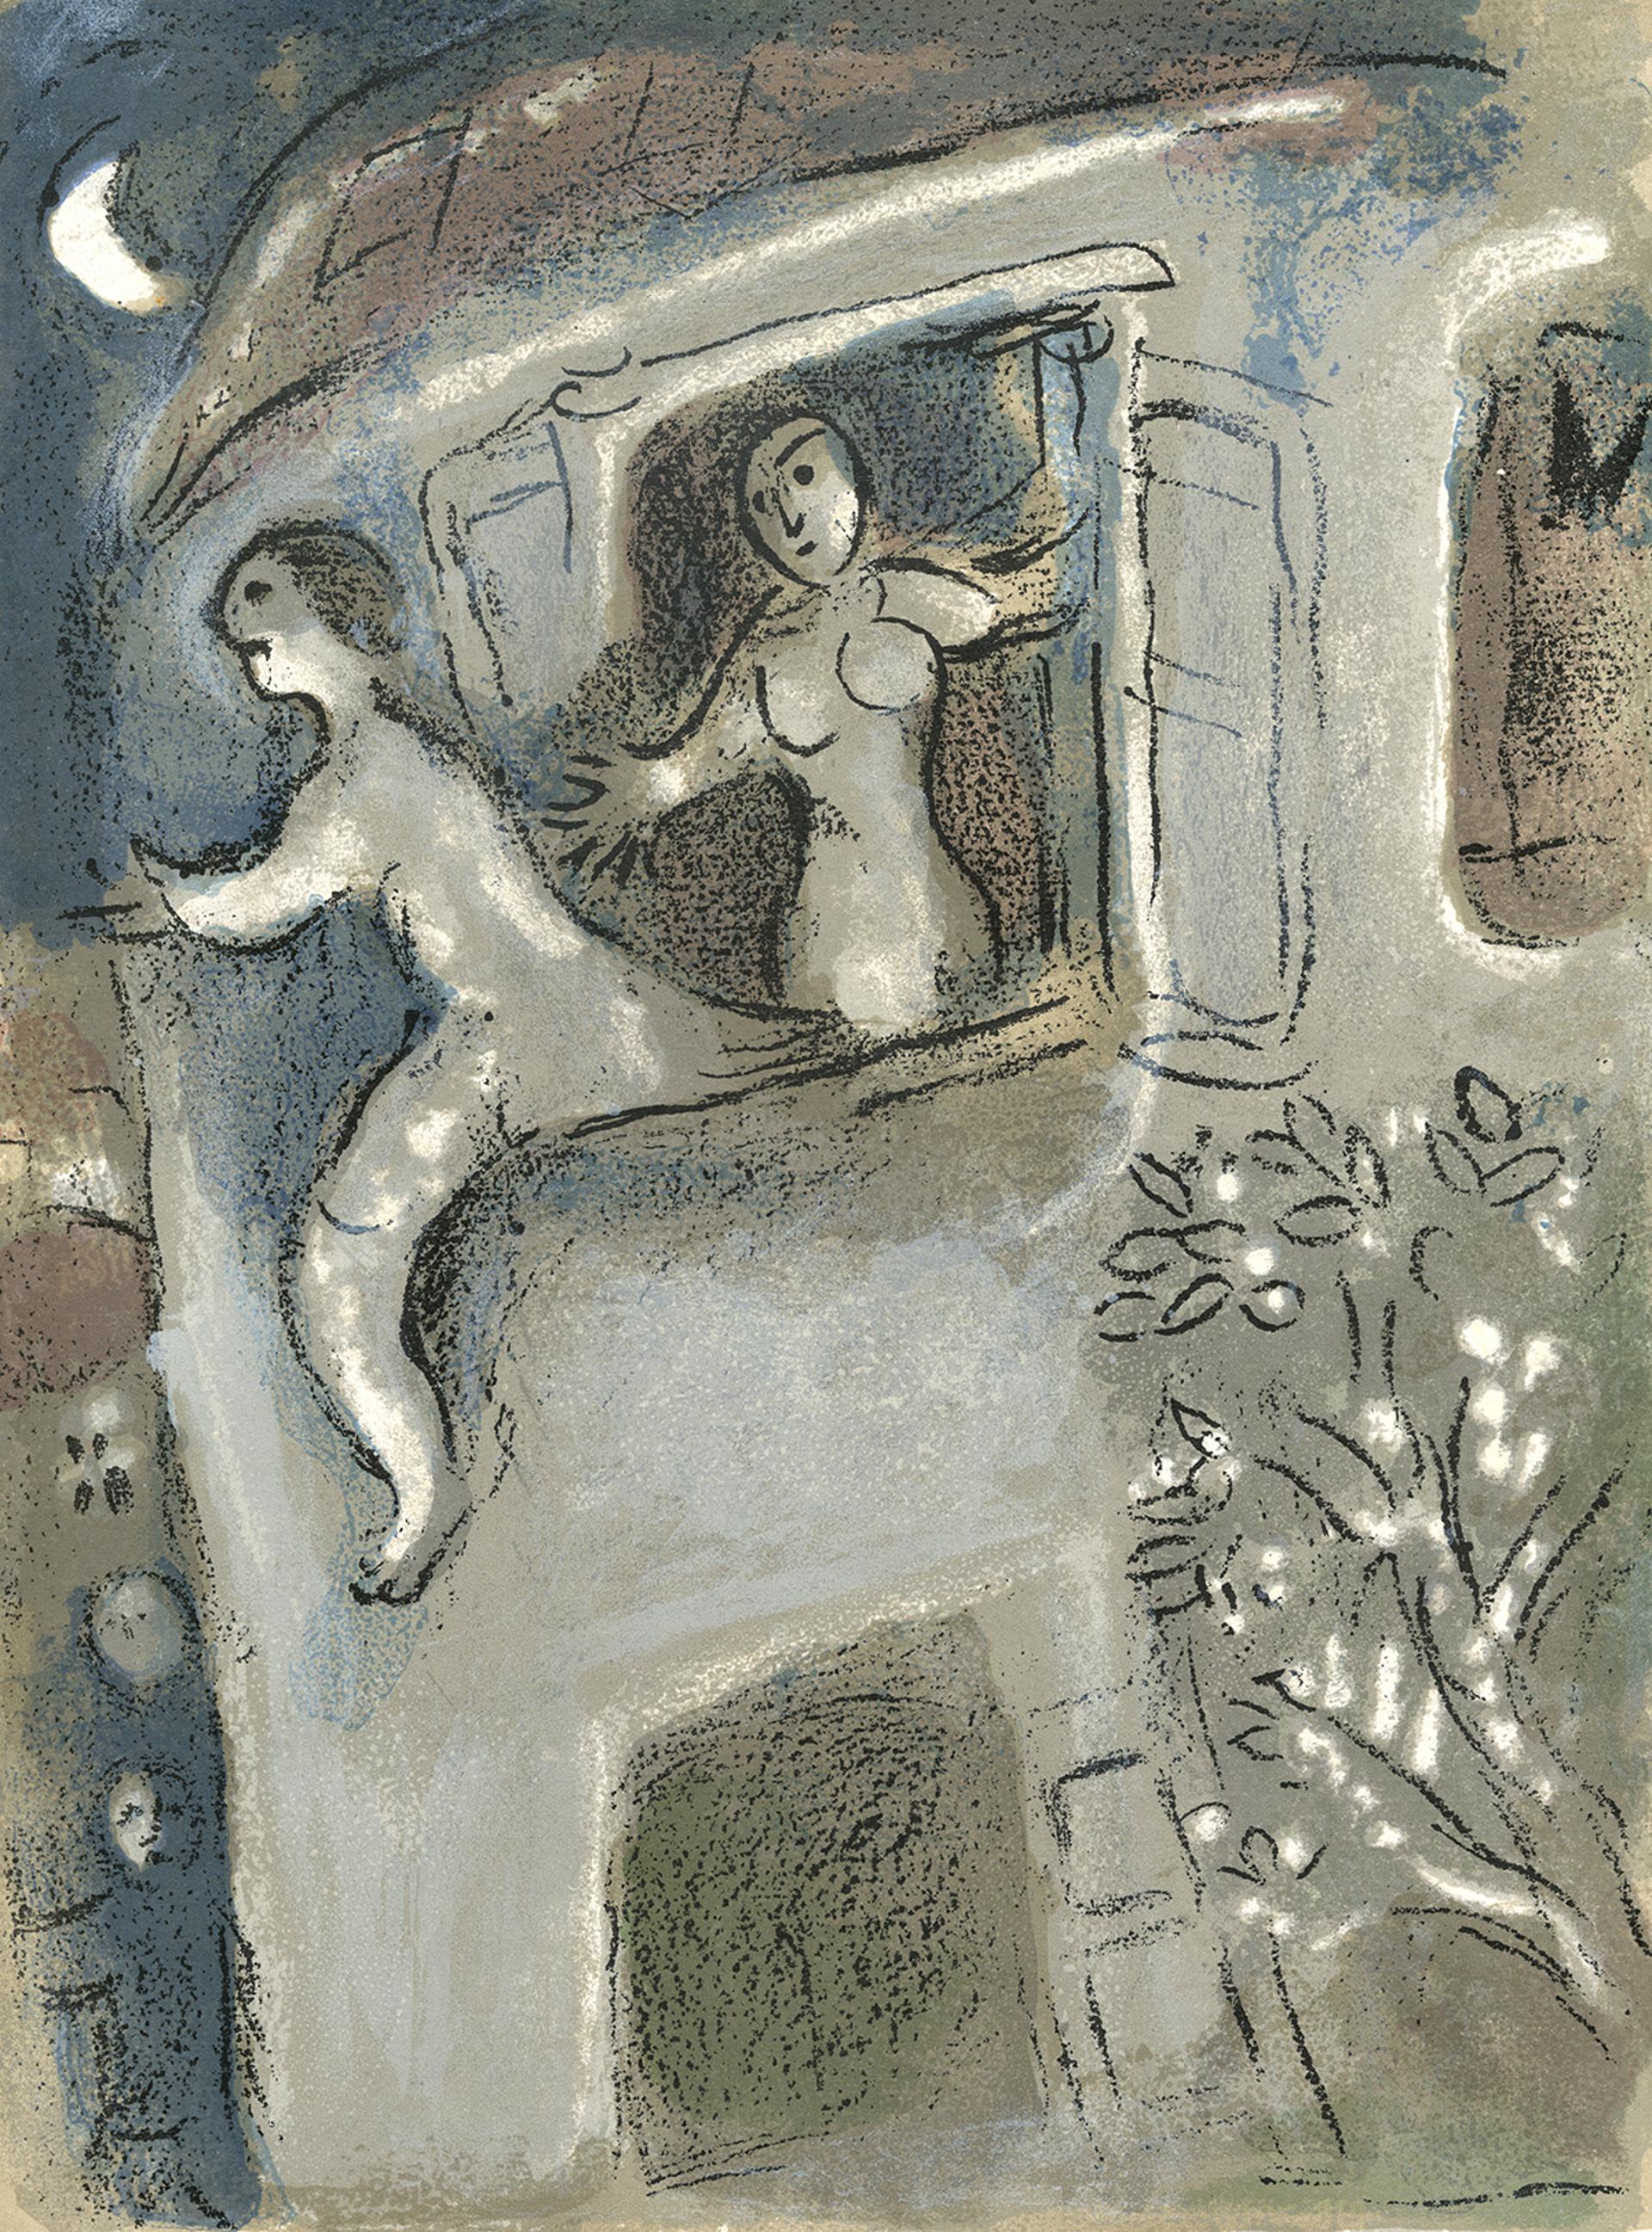 David sauvé par Michal (David Save by Michal), M 250/273 by Marc Chagall